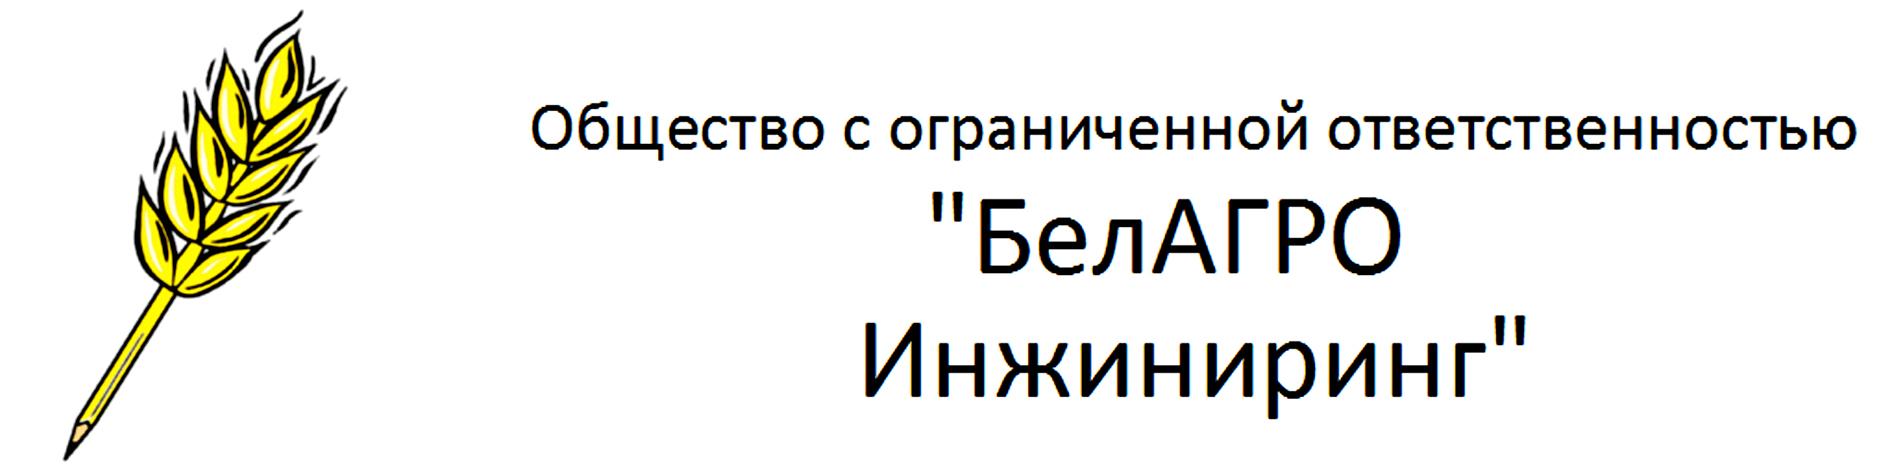 БелАГРО Инжиниринг